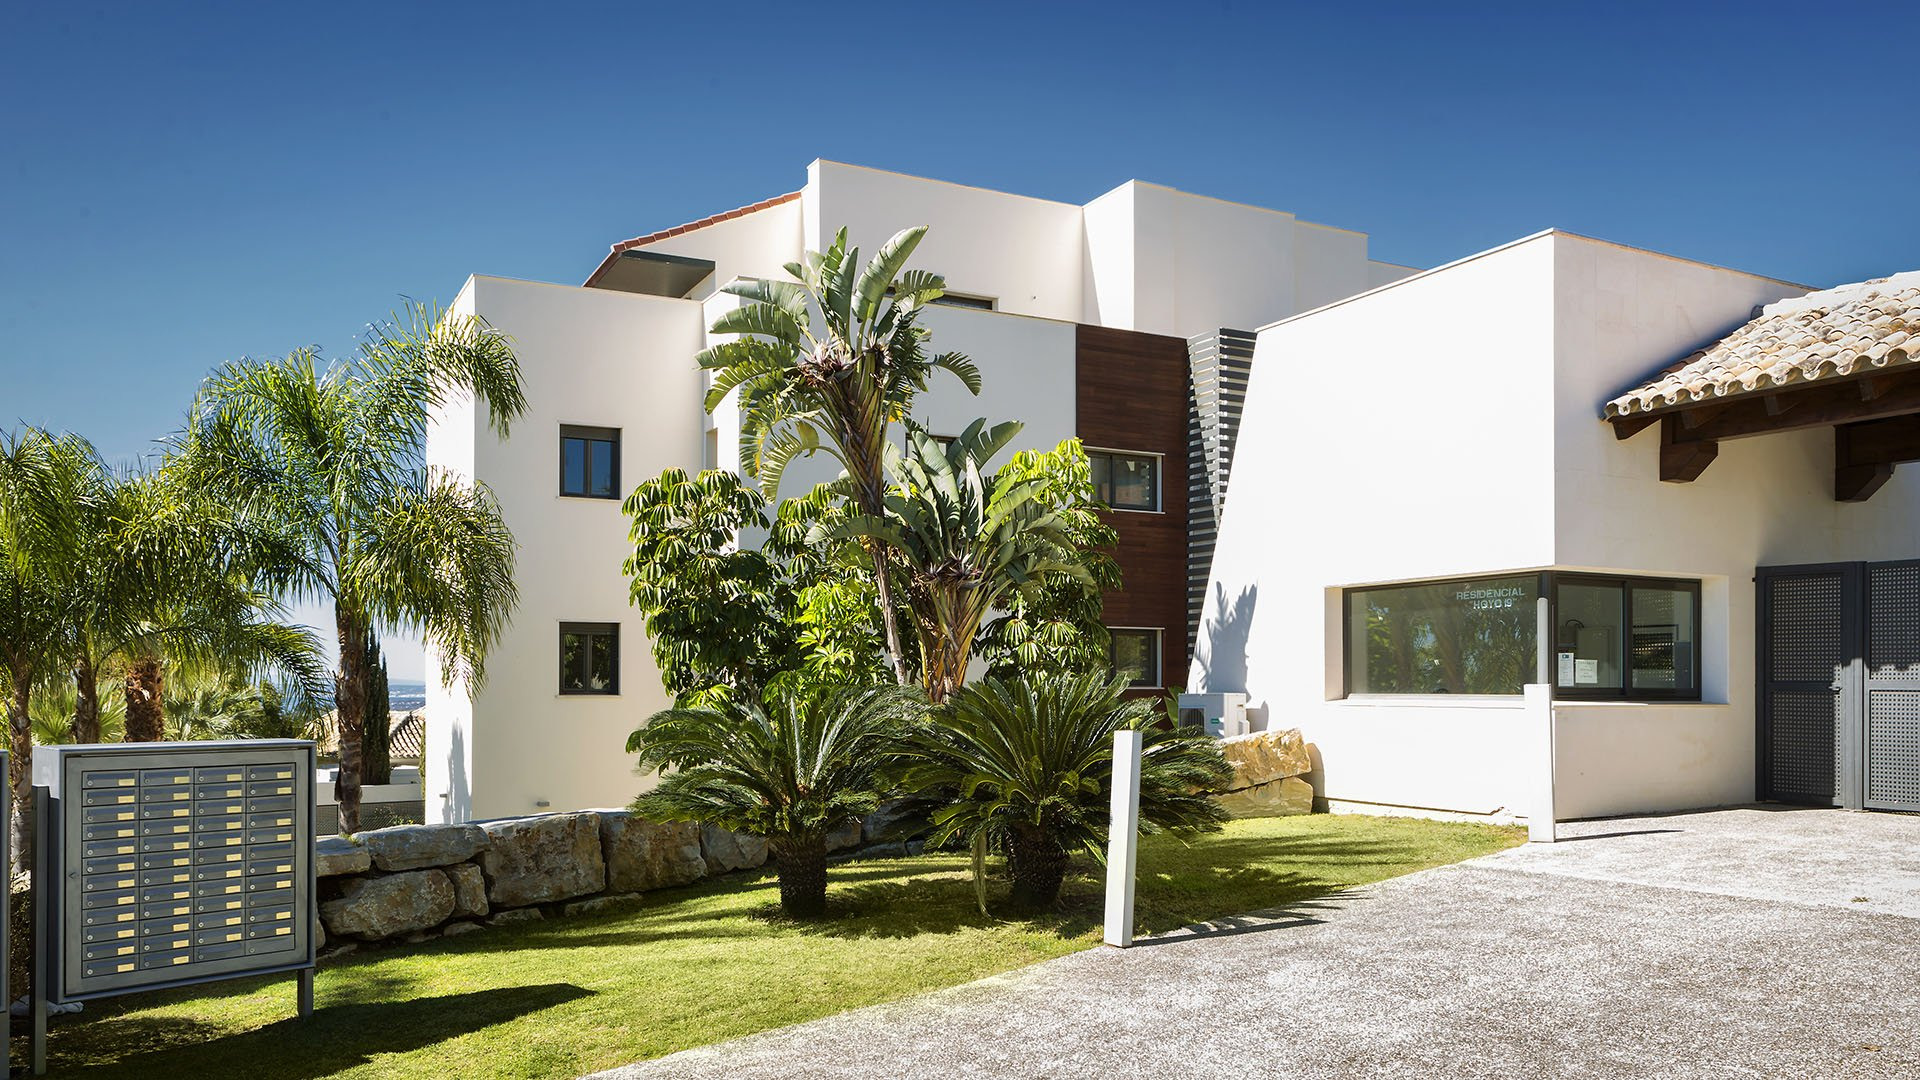 Hoyo 19: Apartments in the prestigious Los Flamingos on the New Golden Mile